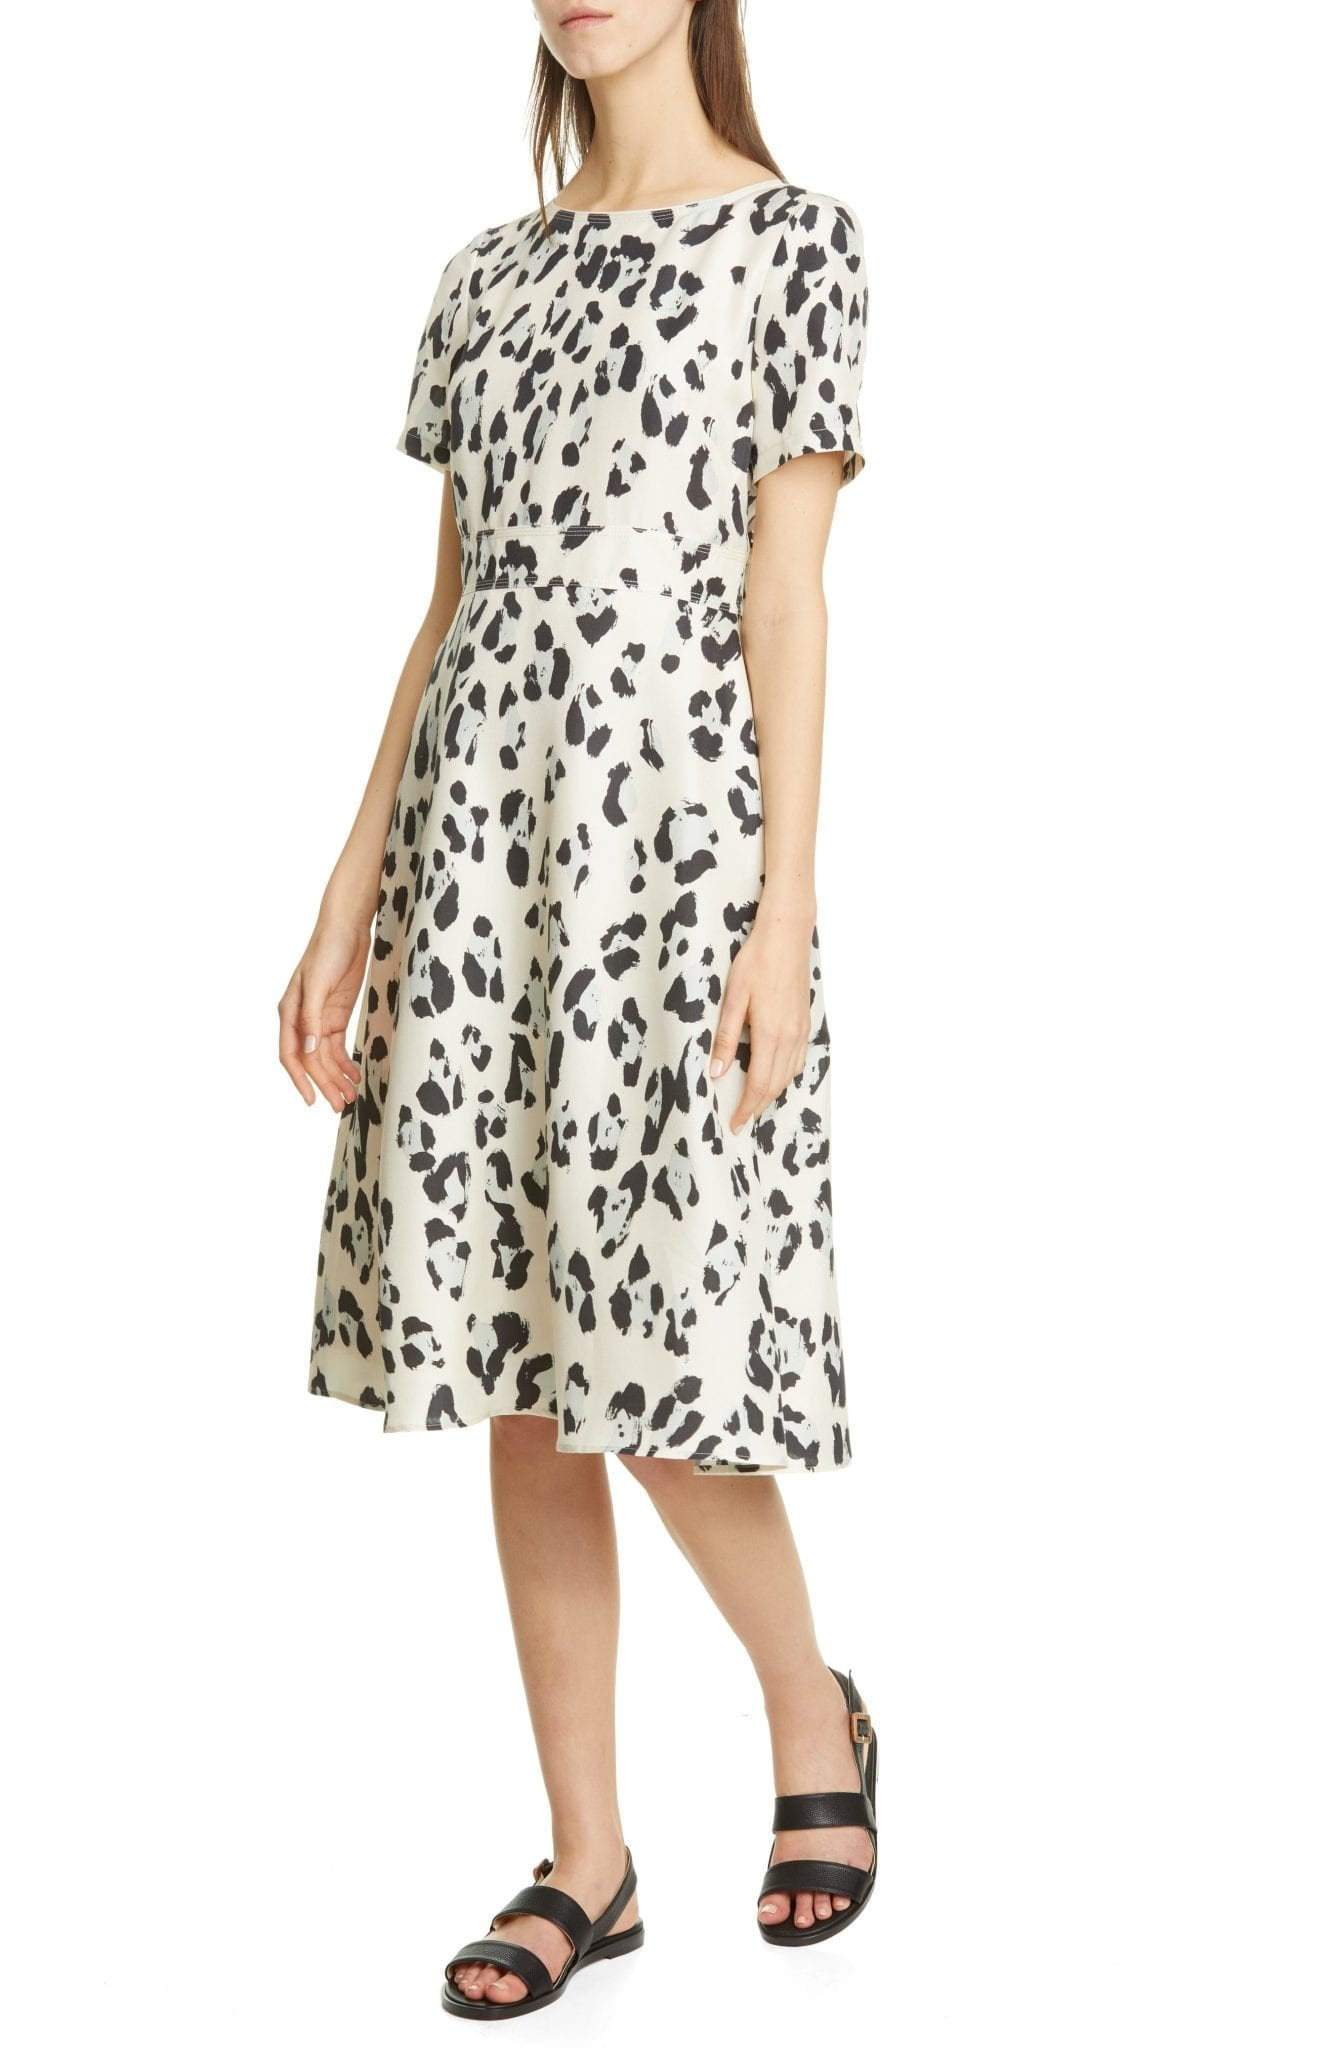 LAFAYETTE 148 NEW YORK Amanda Spot Print Silk Dress